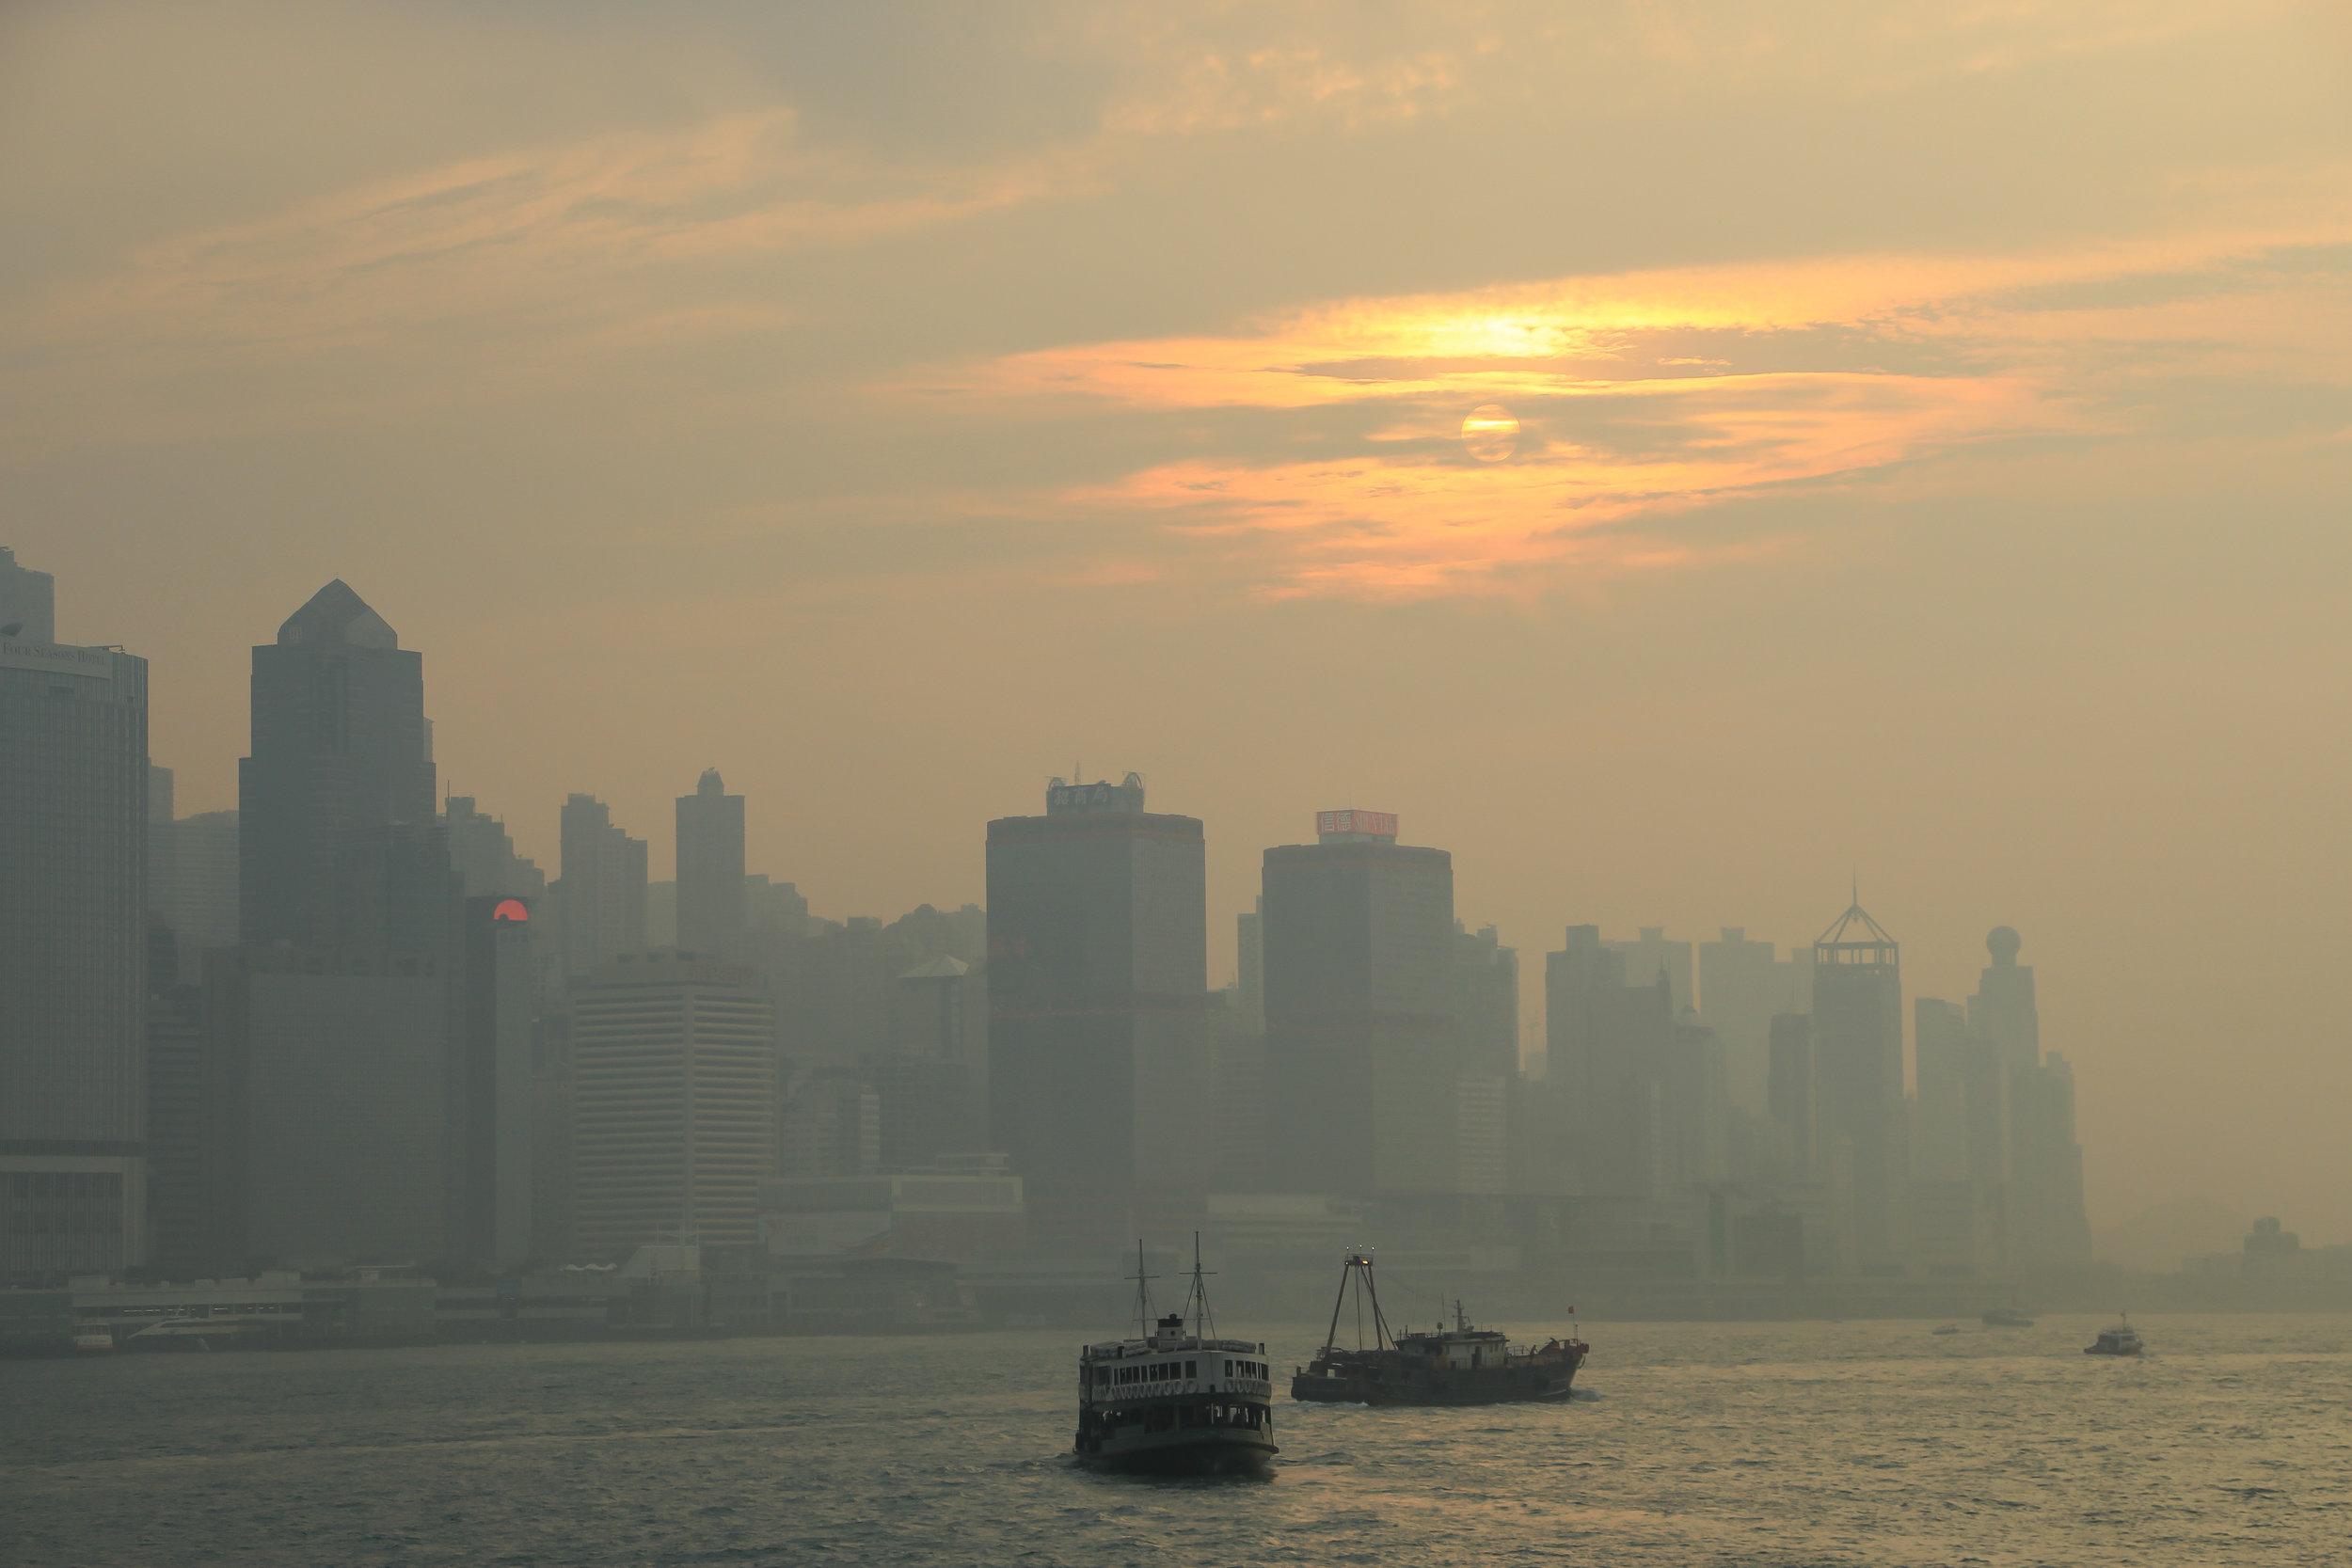 HONG KONG, HONG KONG ISLAND, SOUTH CHINA SEA, people, sunset, ASIA | DOLESSGETMOREDONE.COM |